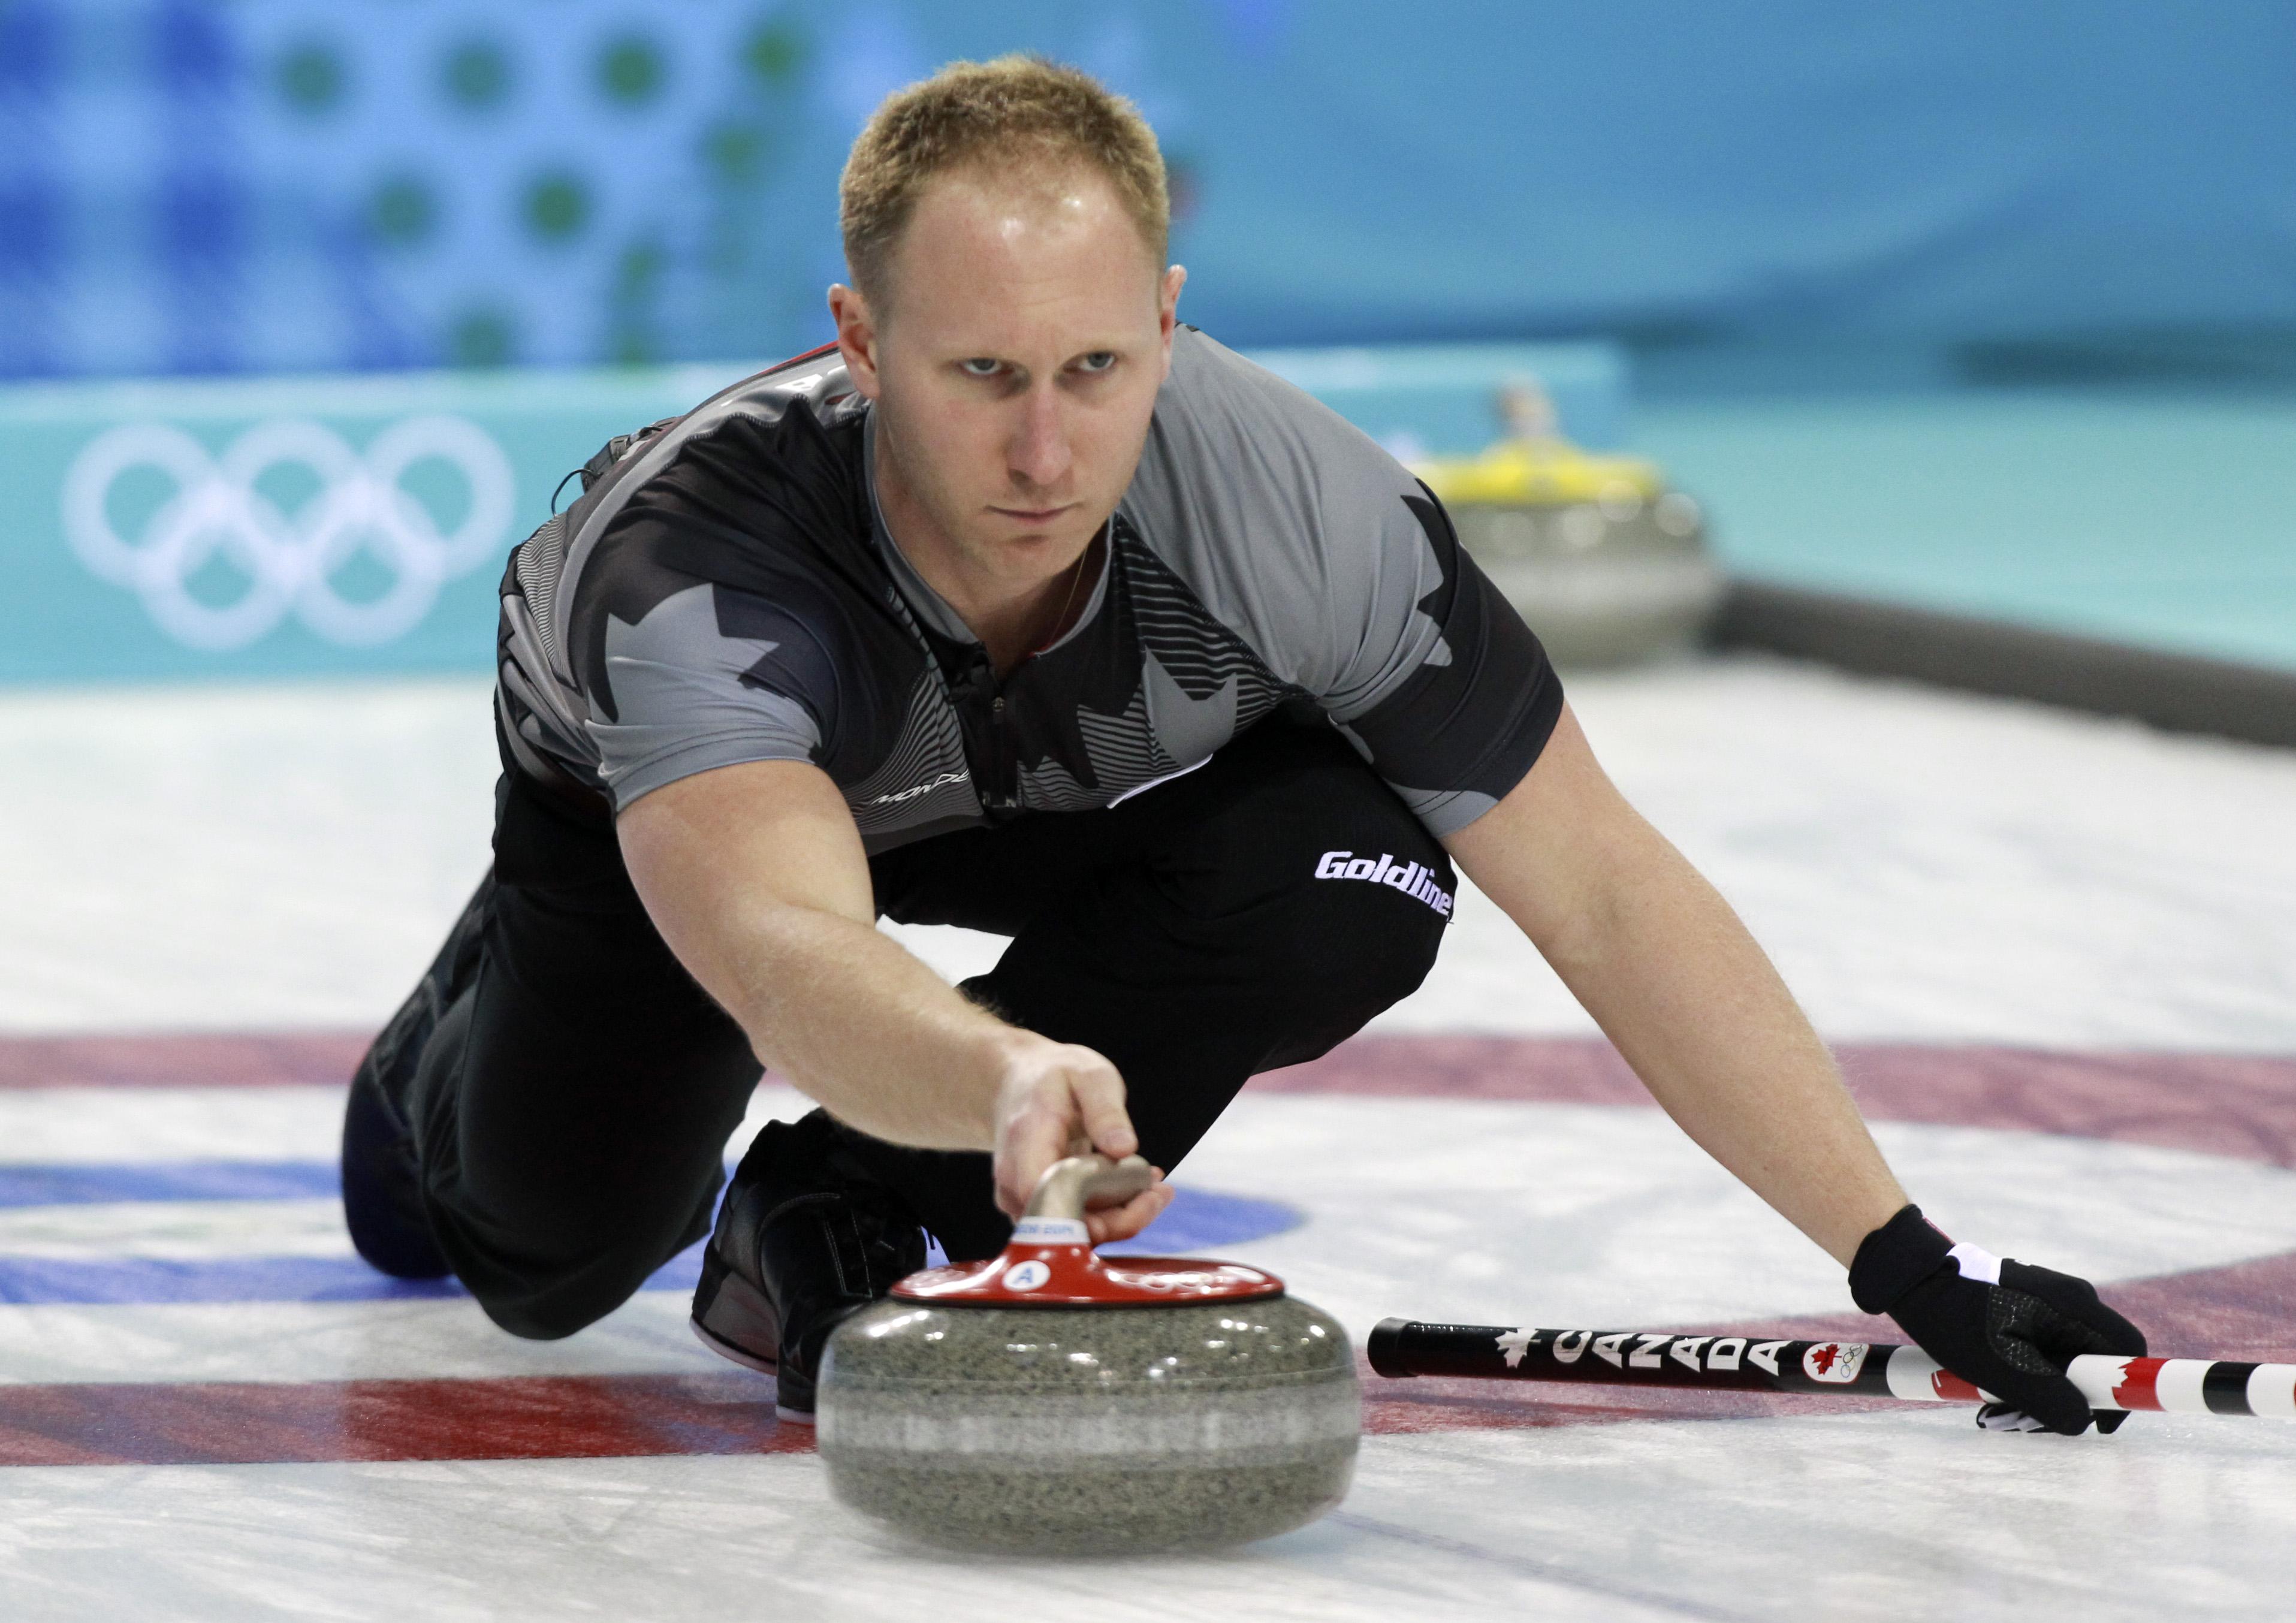 Curling - Canada vs. Sweden